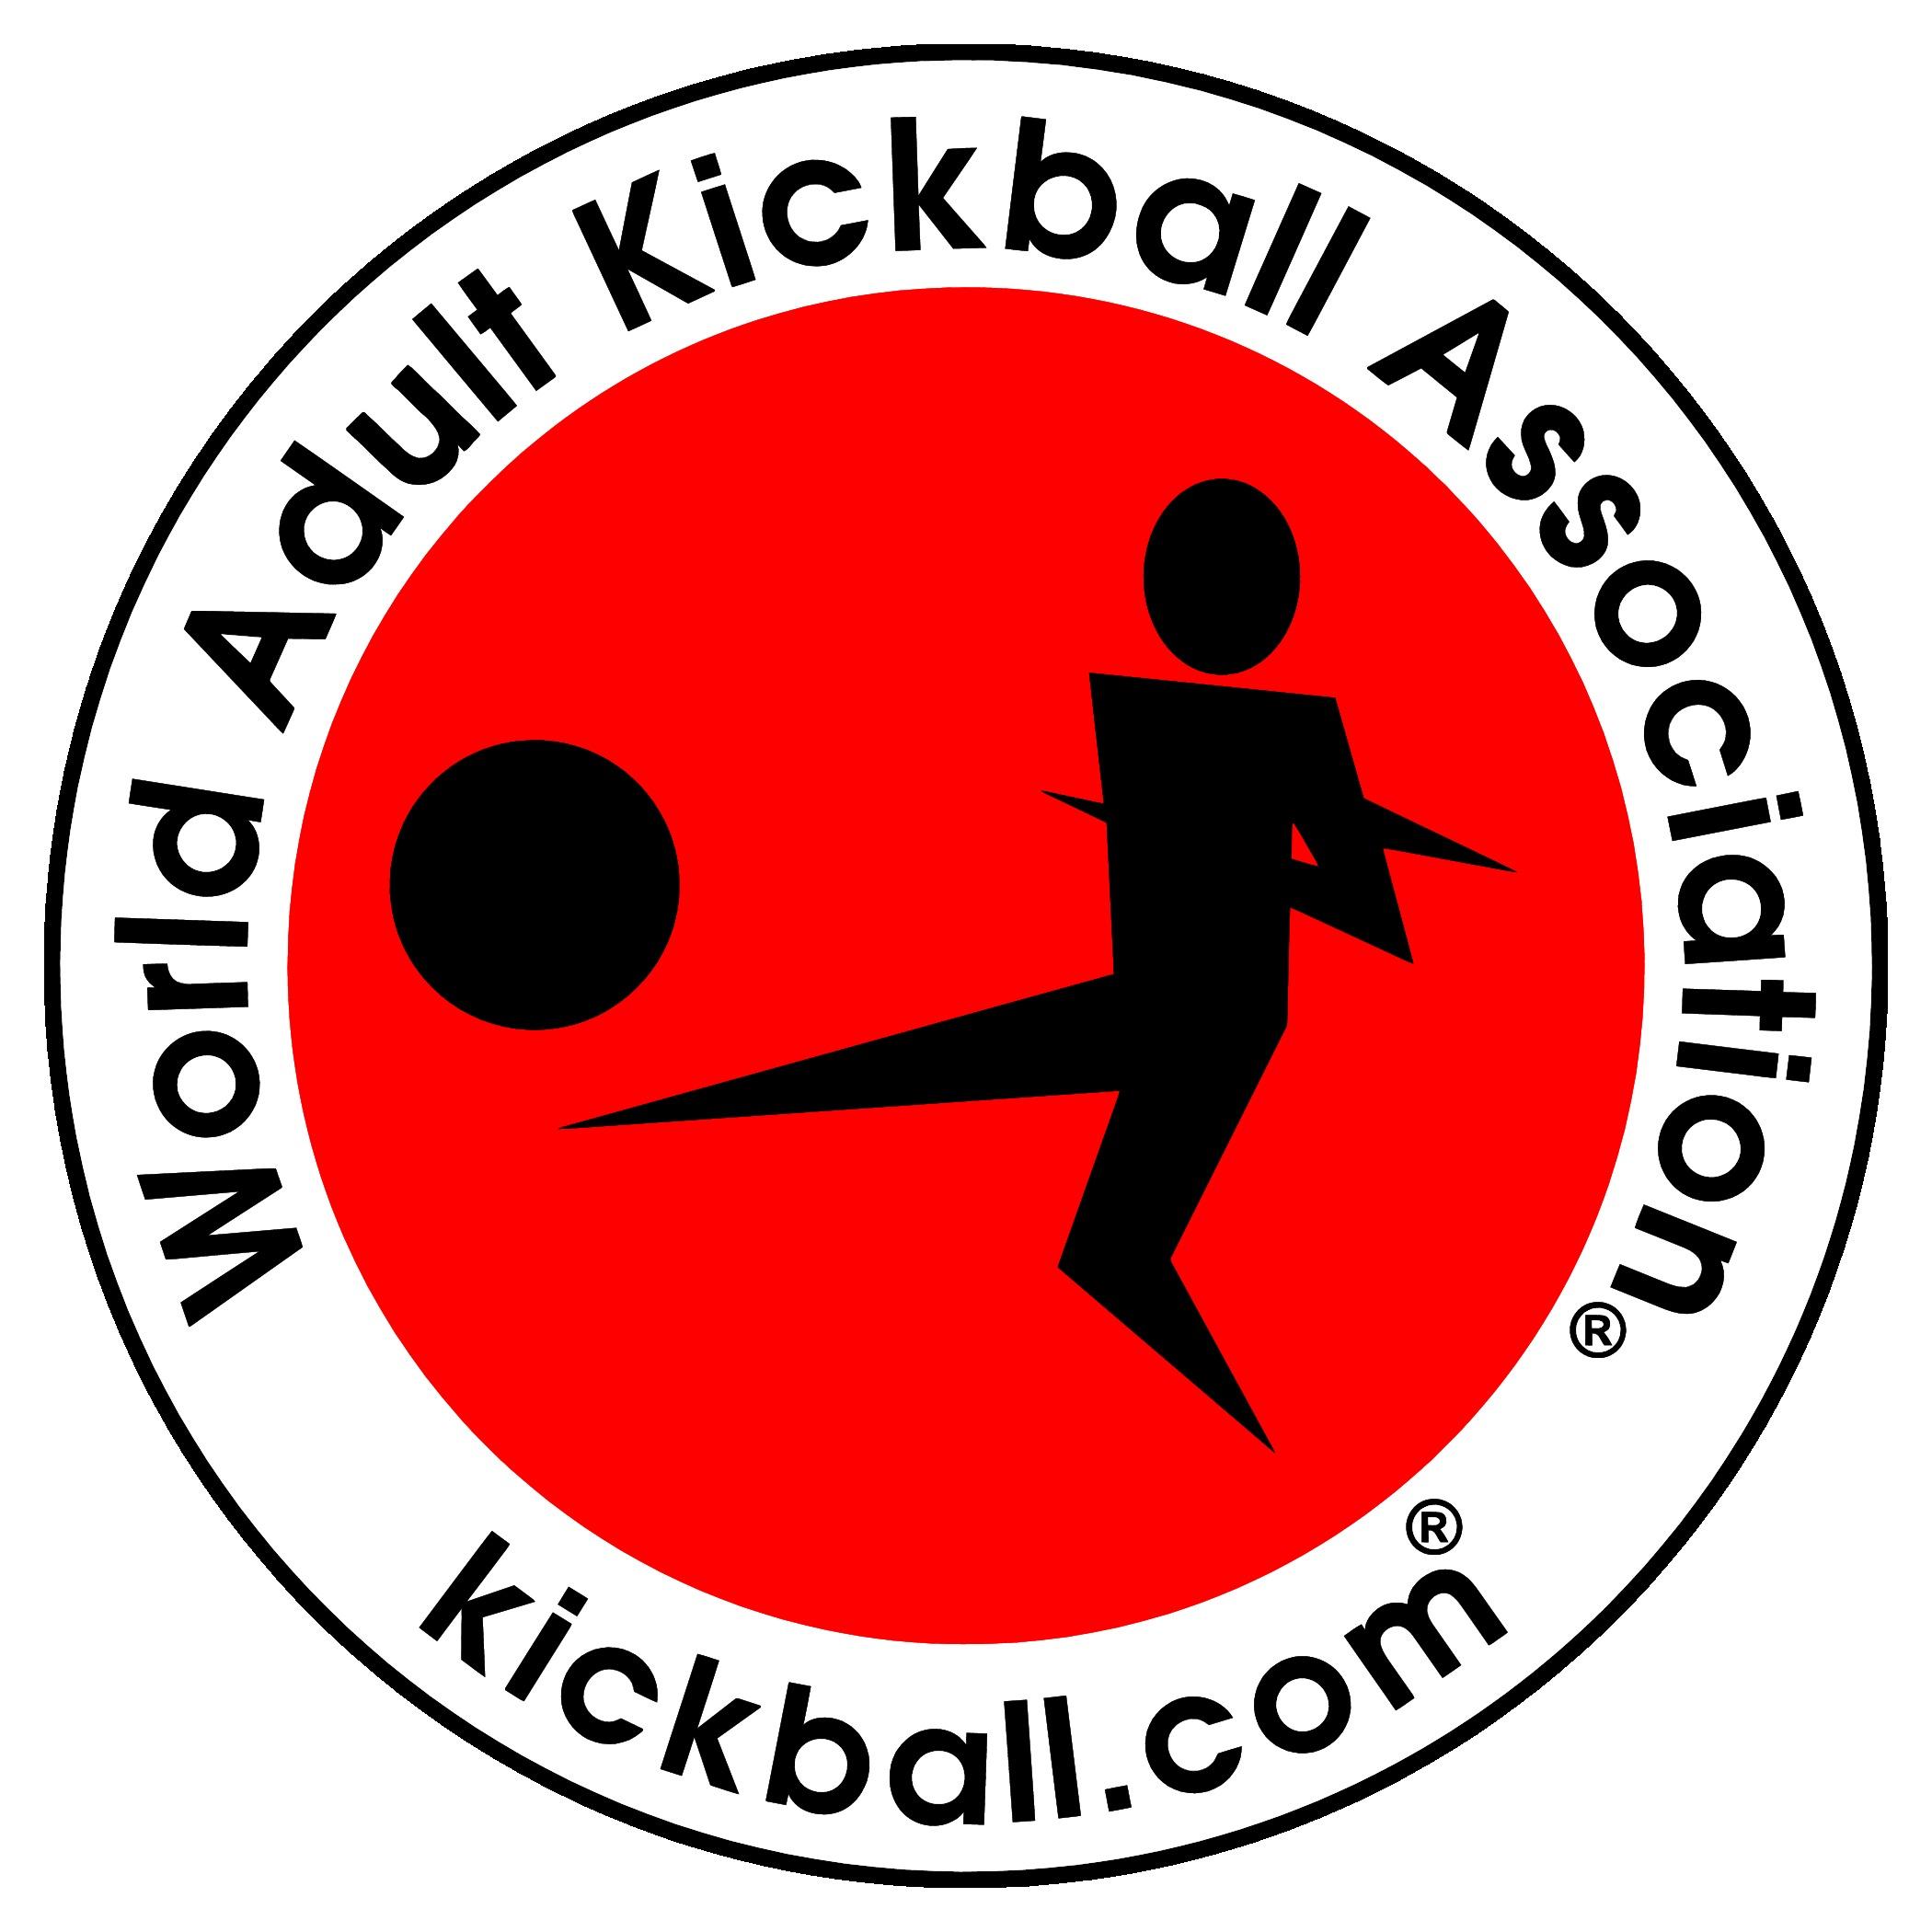 2100x2100 Kickball Logo Clipart